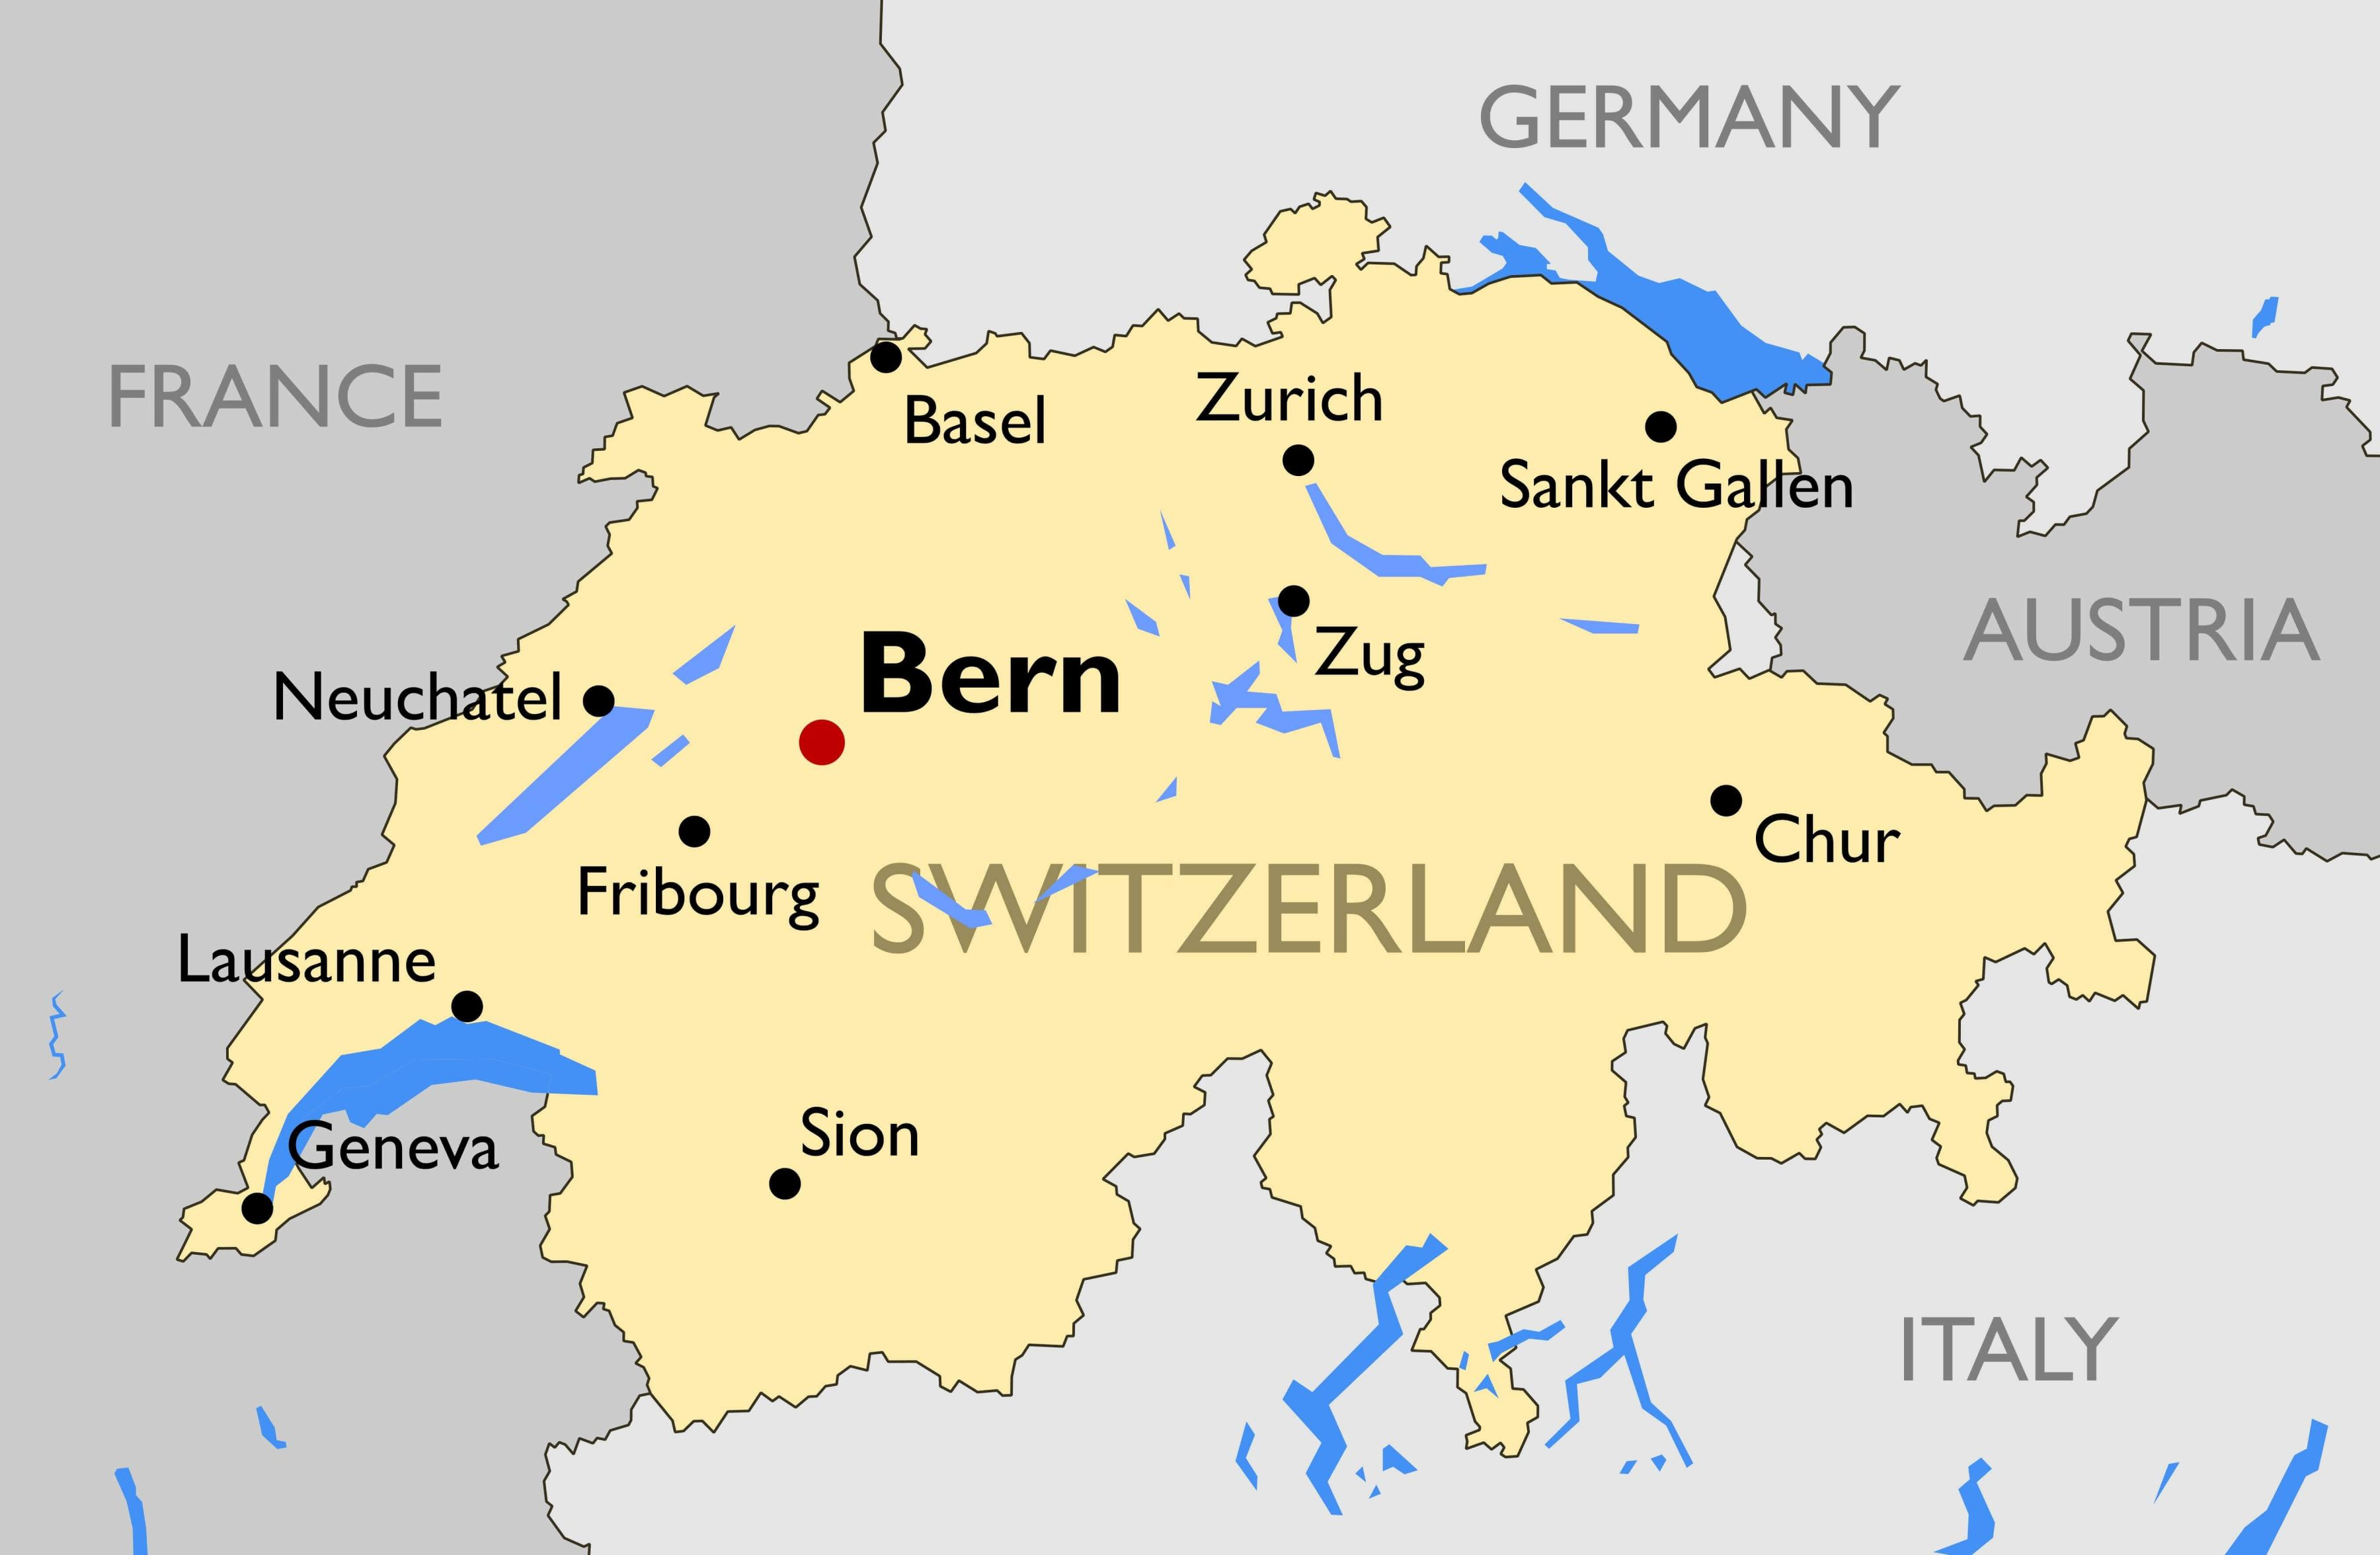 Schweiz Byer Kort Kort Over Schweiz Med Storre Byer Western